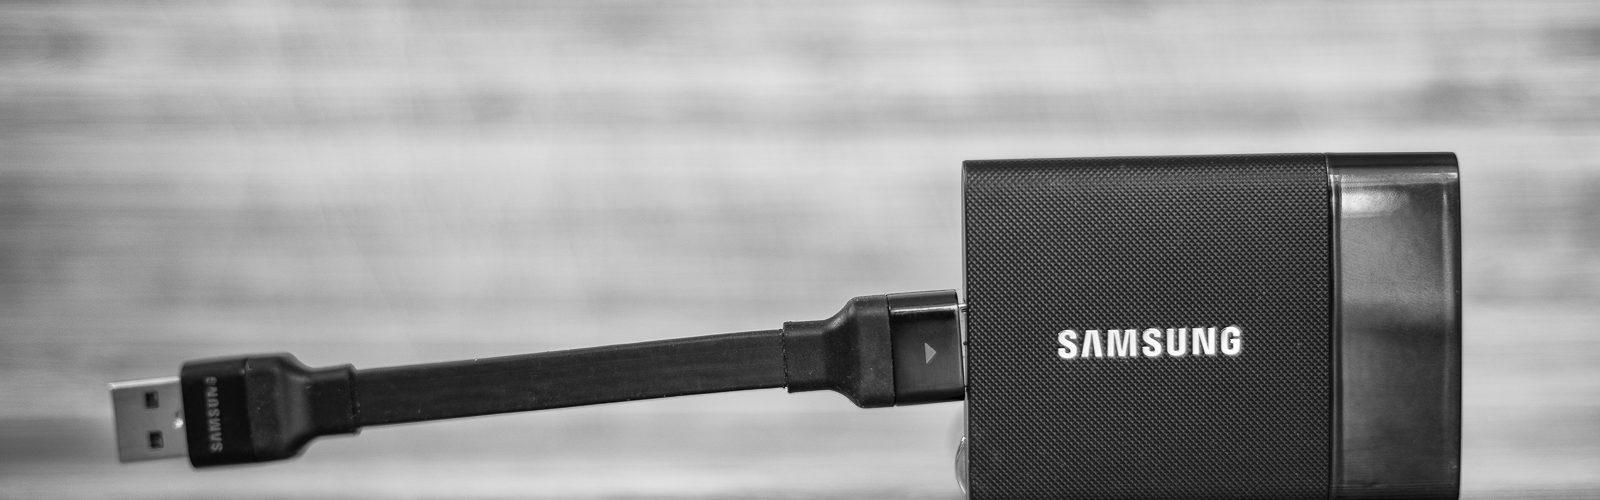 Samsung T1 SSD | Norbert Eder Photography